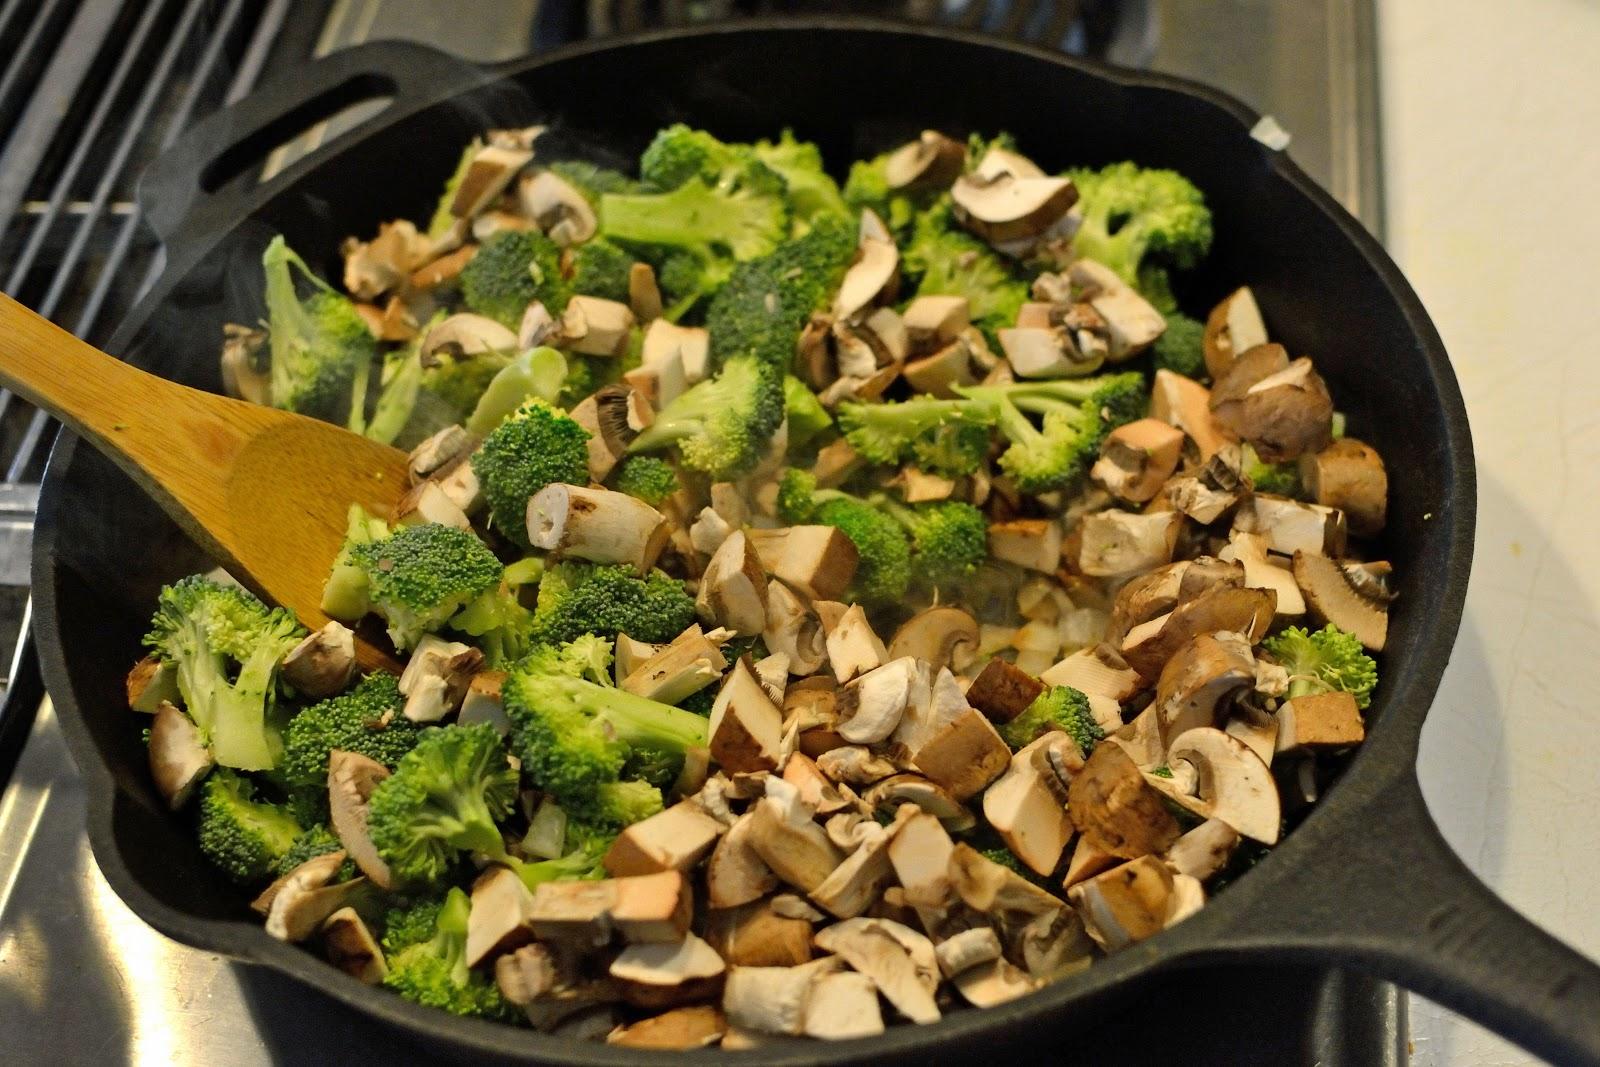 Ashley\'s Green Life: WIAW & Cheesy Mushroom & Broccoli Skillet Recipe